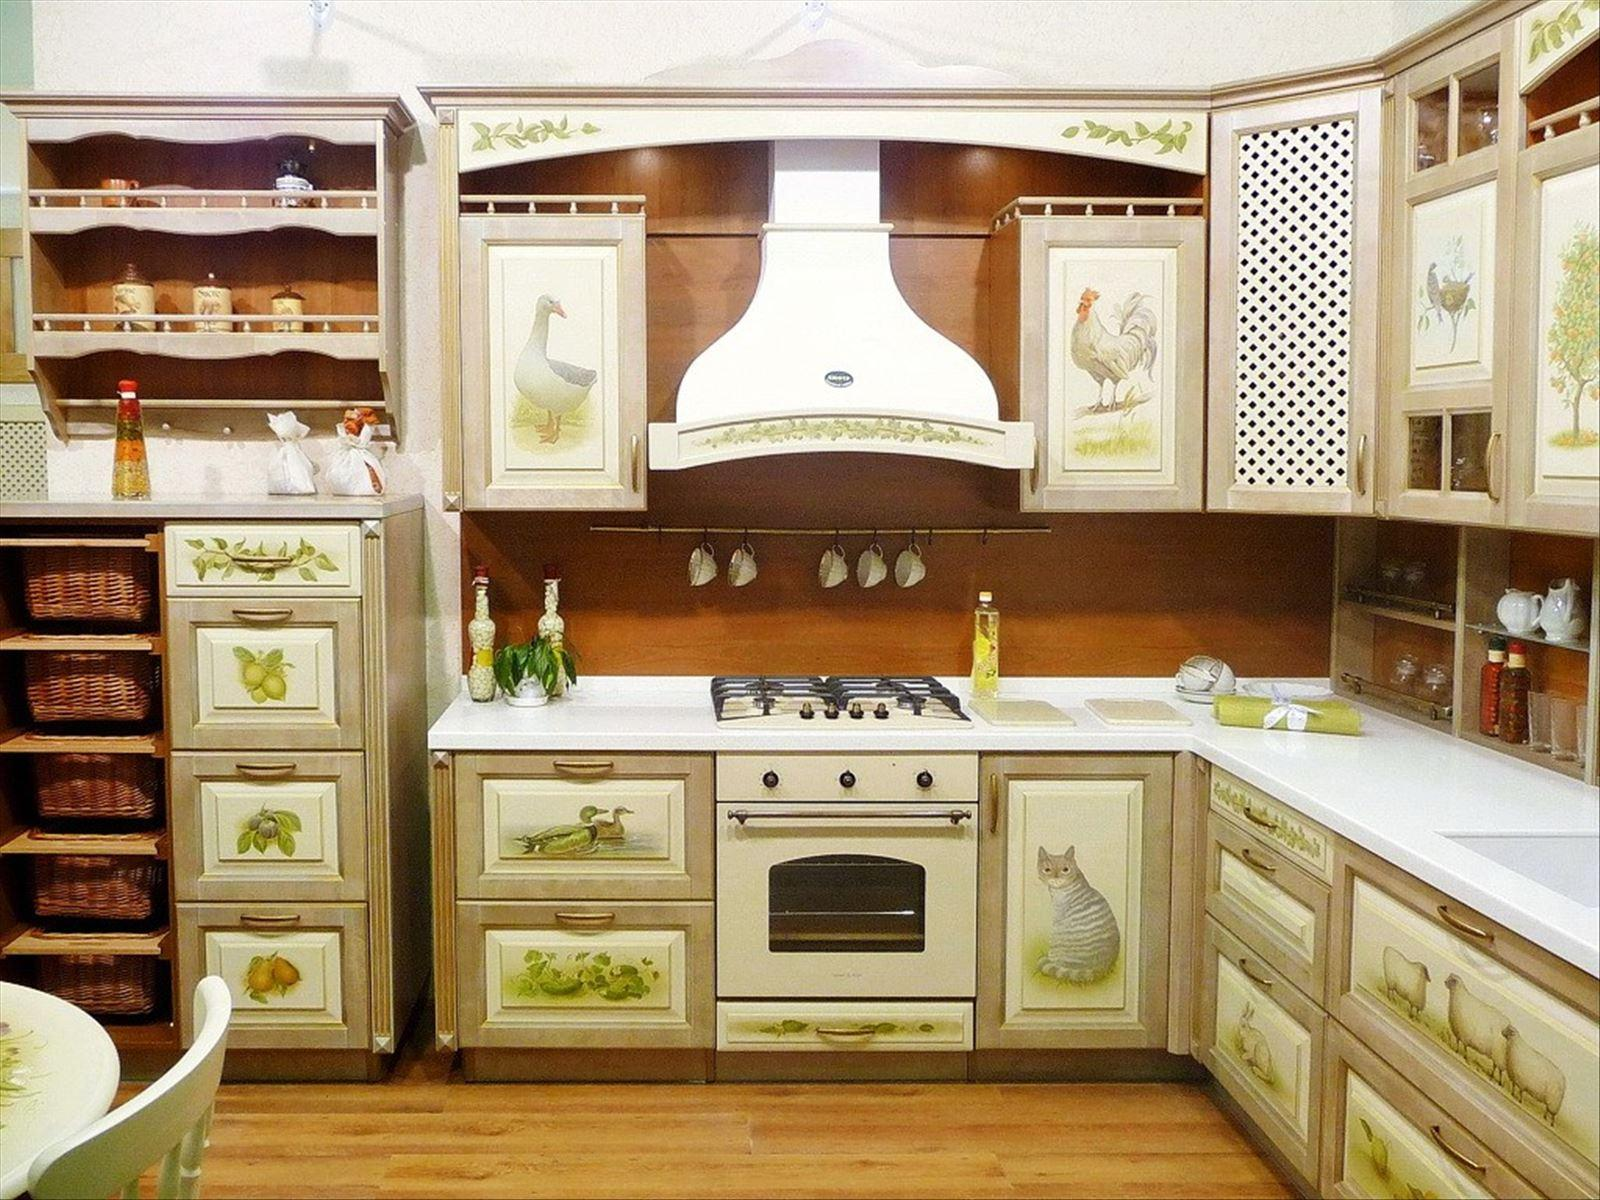 Фасад для кухни с рисунком своими руками